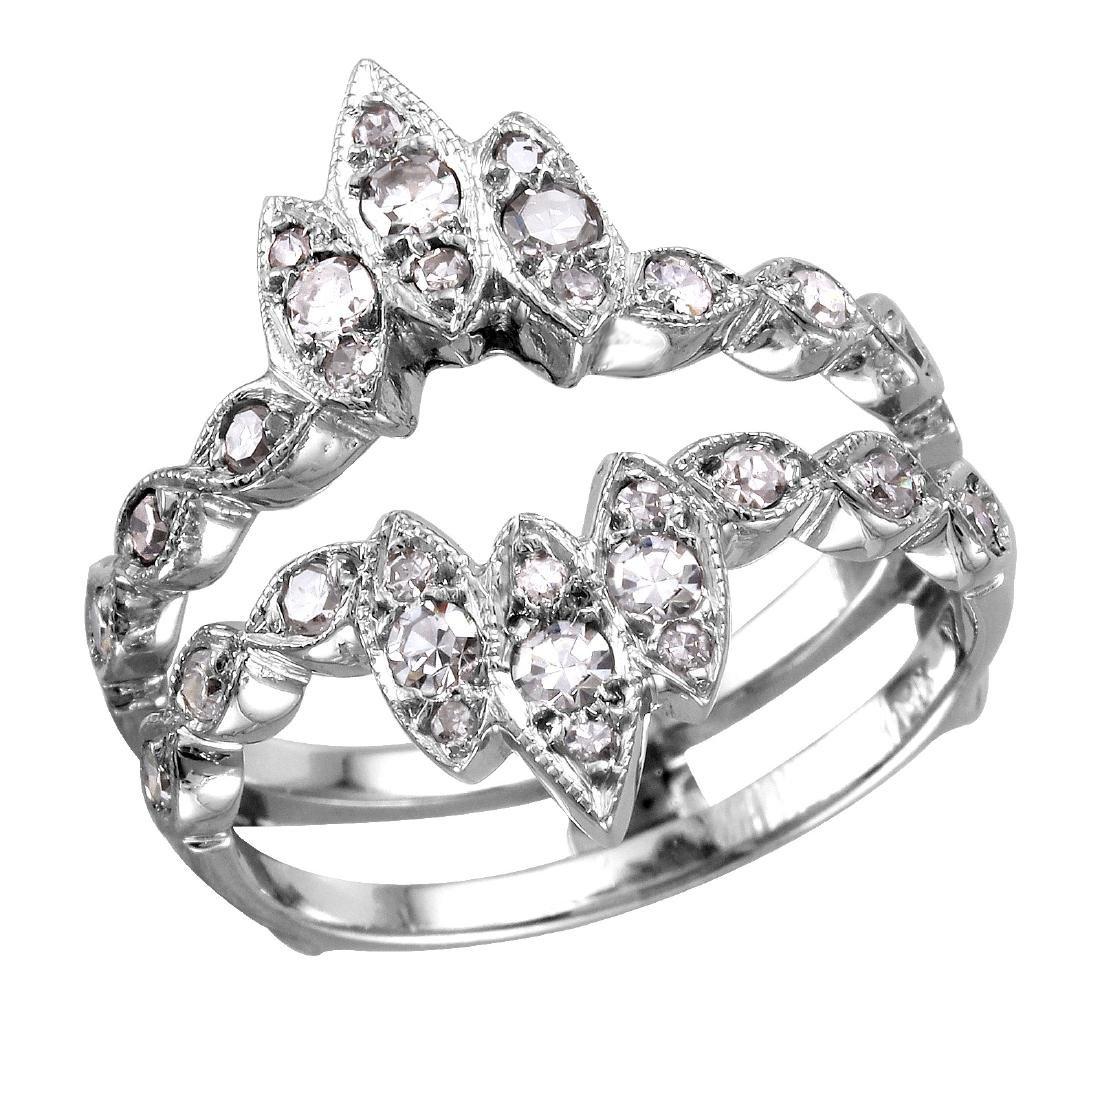 14KT White Gold Diamond Ring/Guard